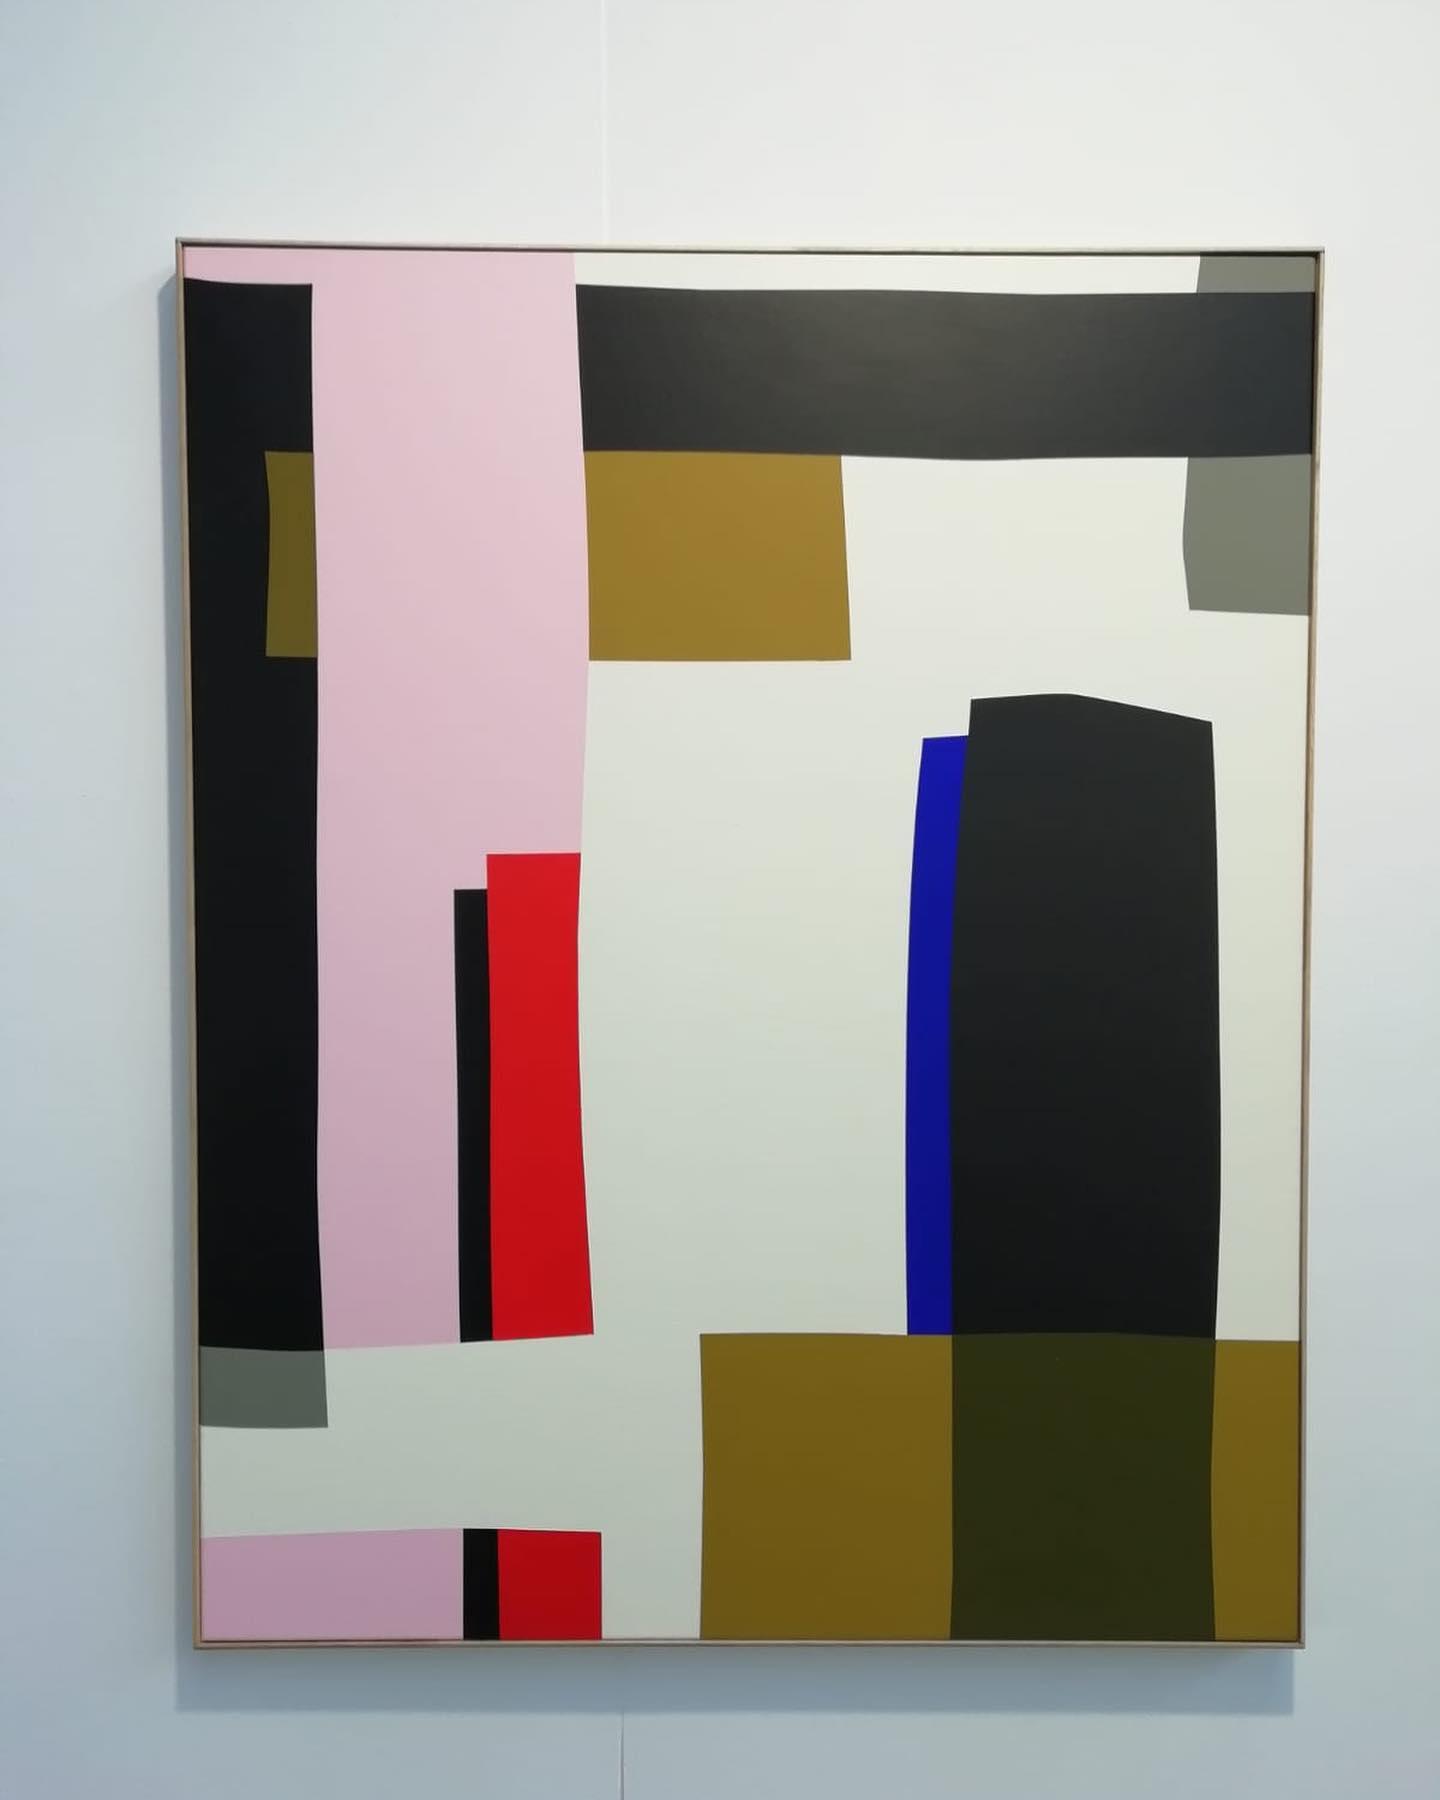 Always friendly neighbours✨ François Bonnel at Macadam Gallery . . . . @macadamgallery @francois_bonnel_artwork  #affordableartfairbrussels #galerieisabellelaverny #isabellelavernygallery